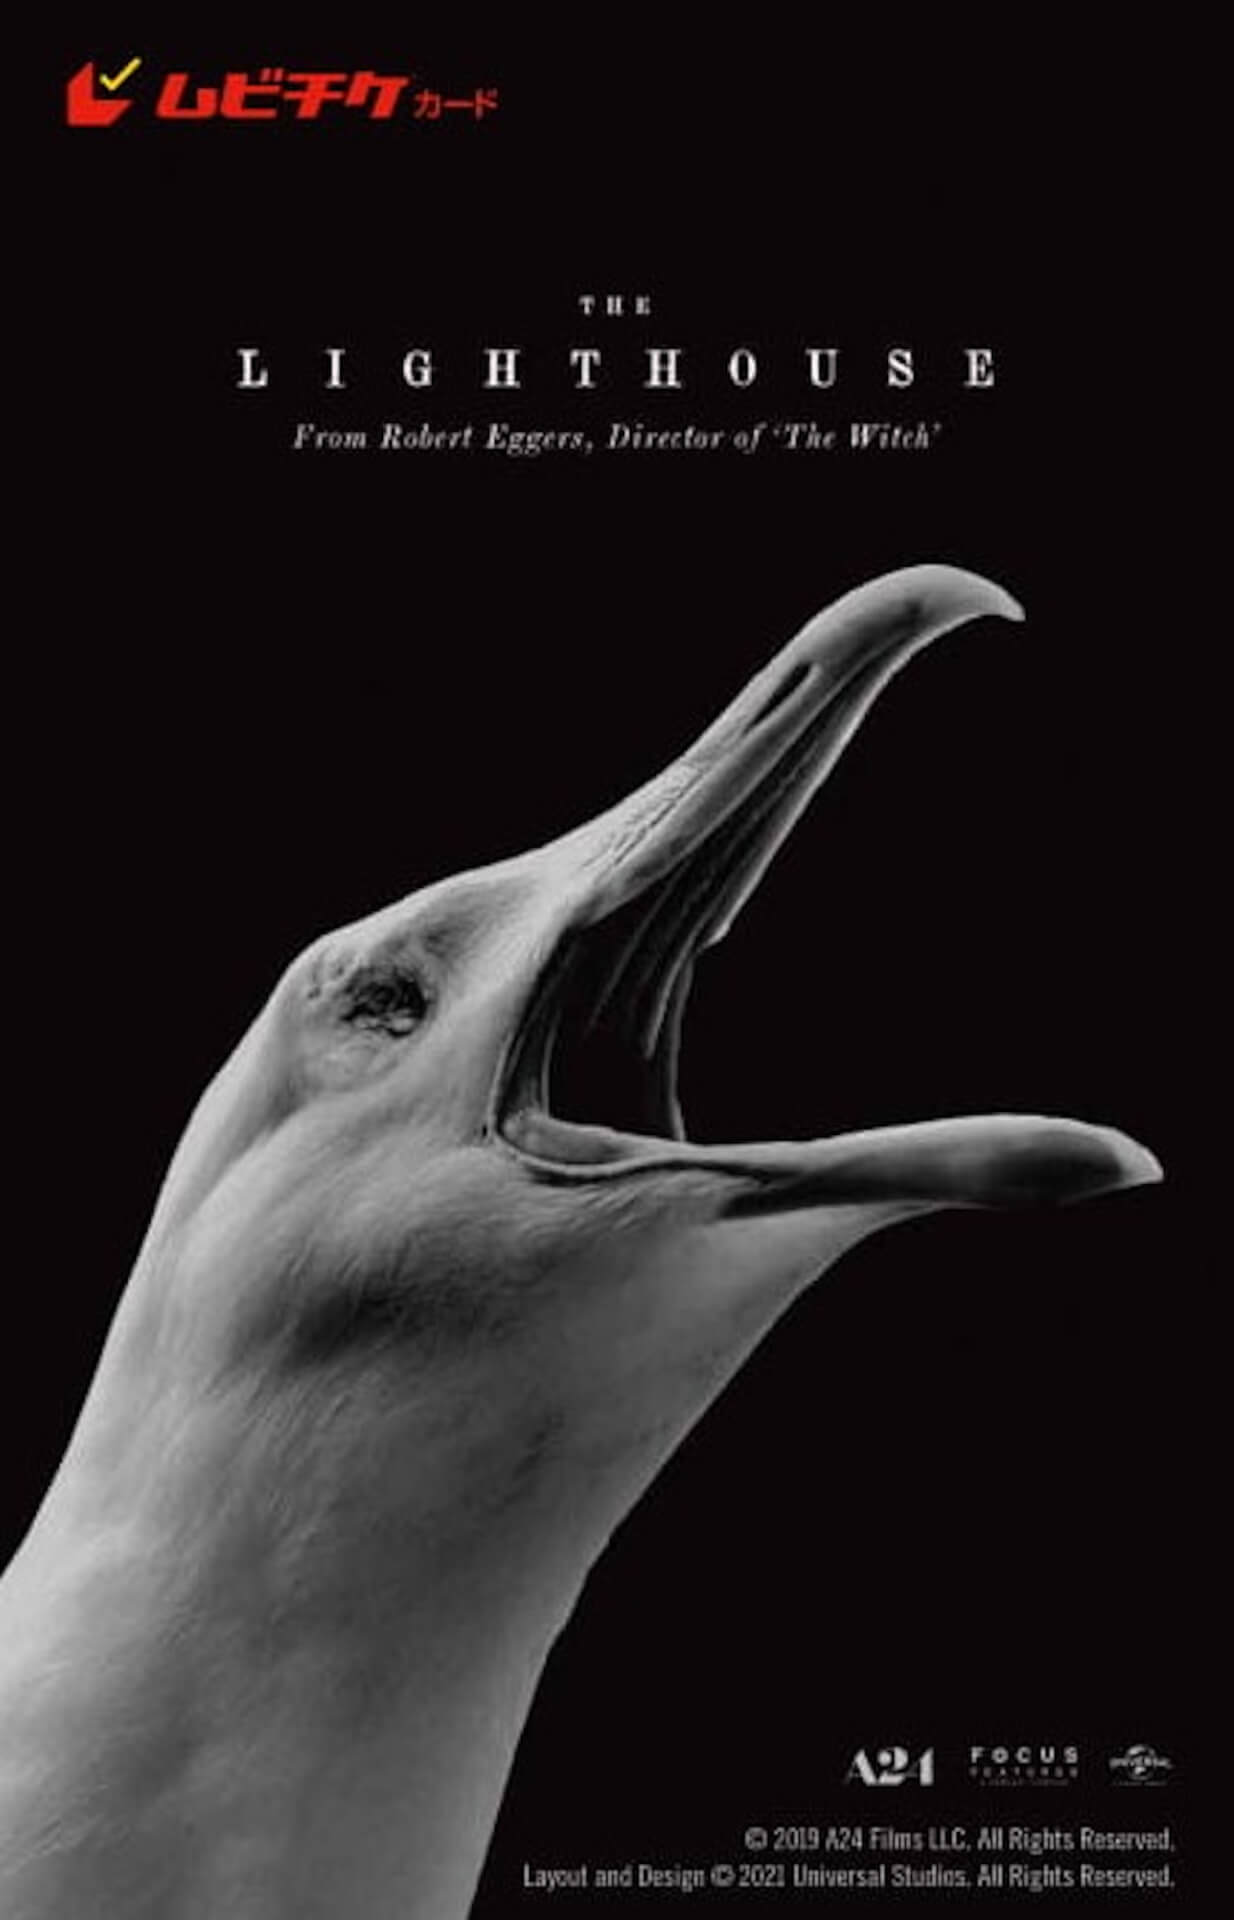 A24、狂気の問題作『ライトハウス』が7月日本公開!シーン写真4点解禁&特典付きムビチケ発売決定 film210326_thelighthouse_1